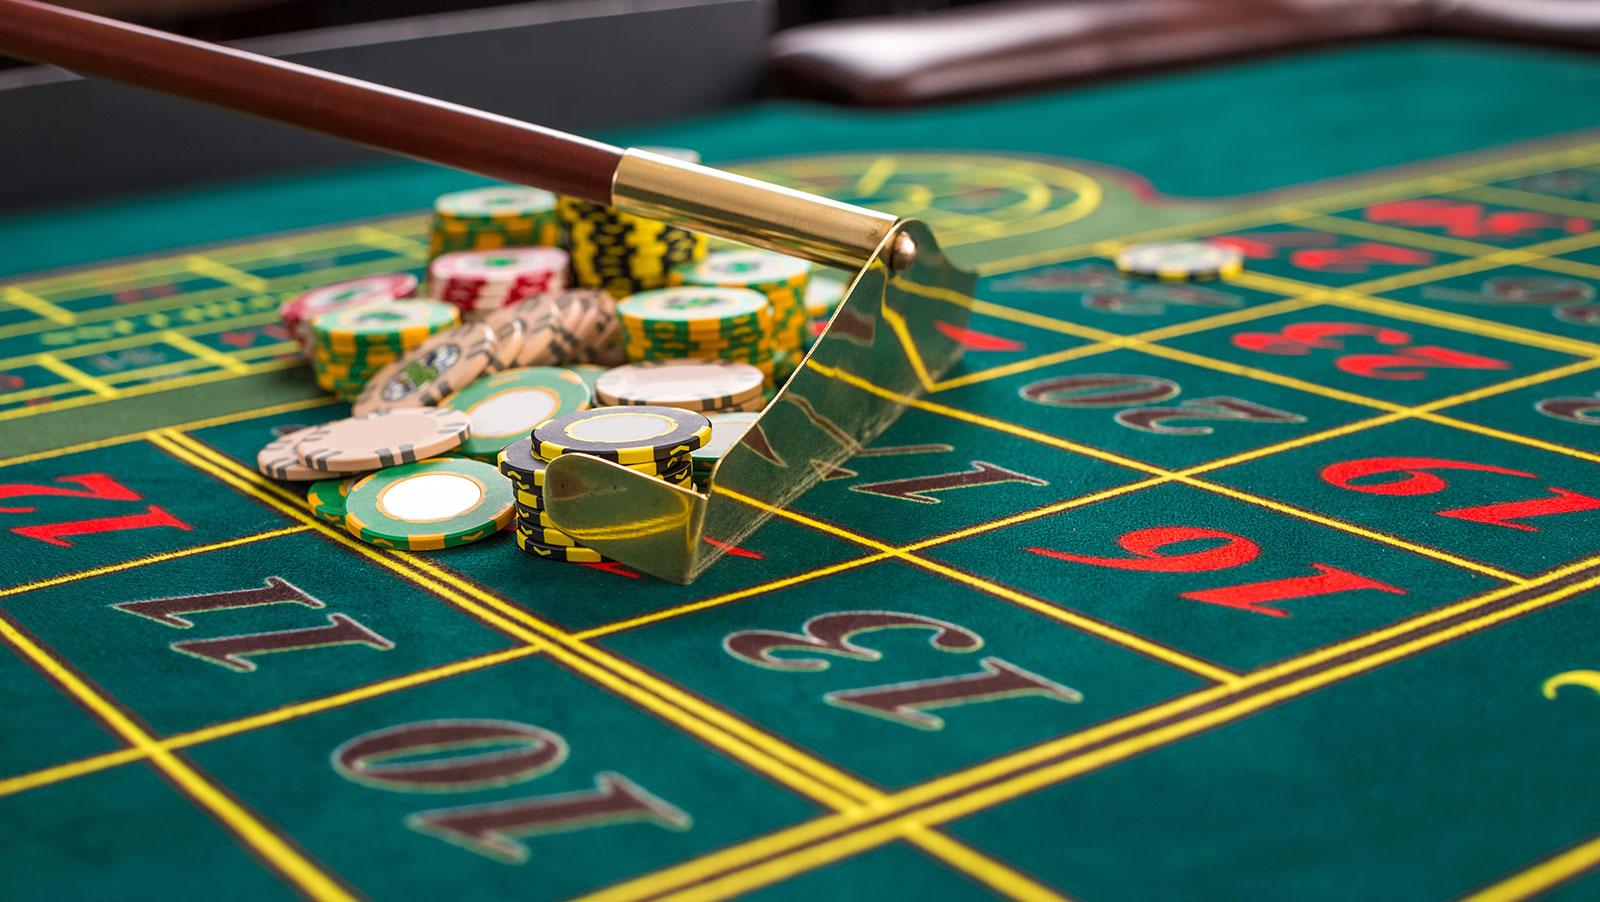 Suncity joins consortium for Japan casino bid